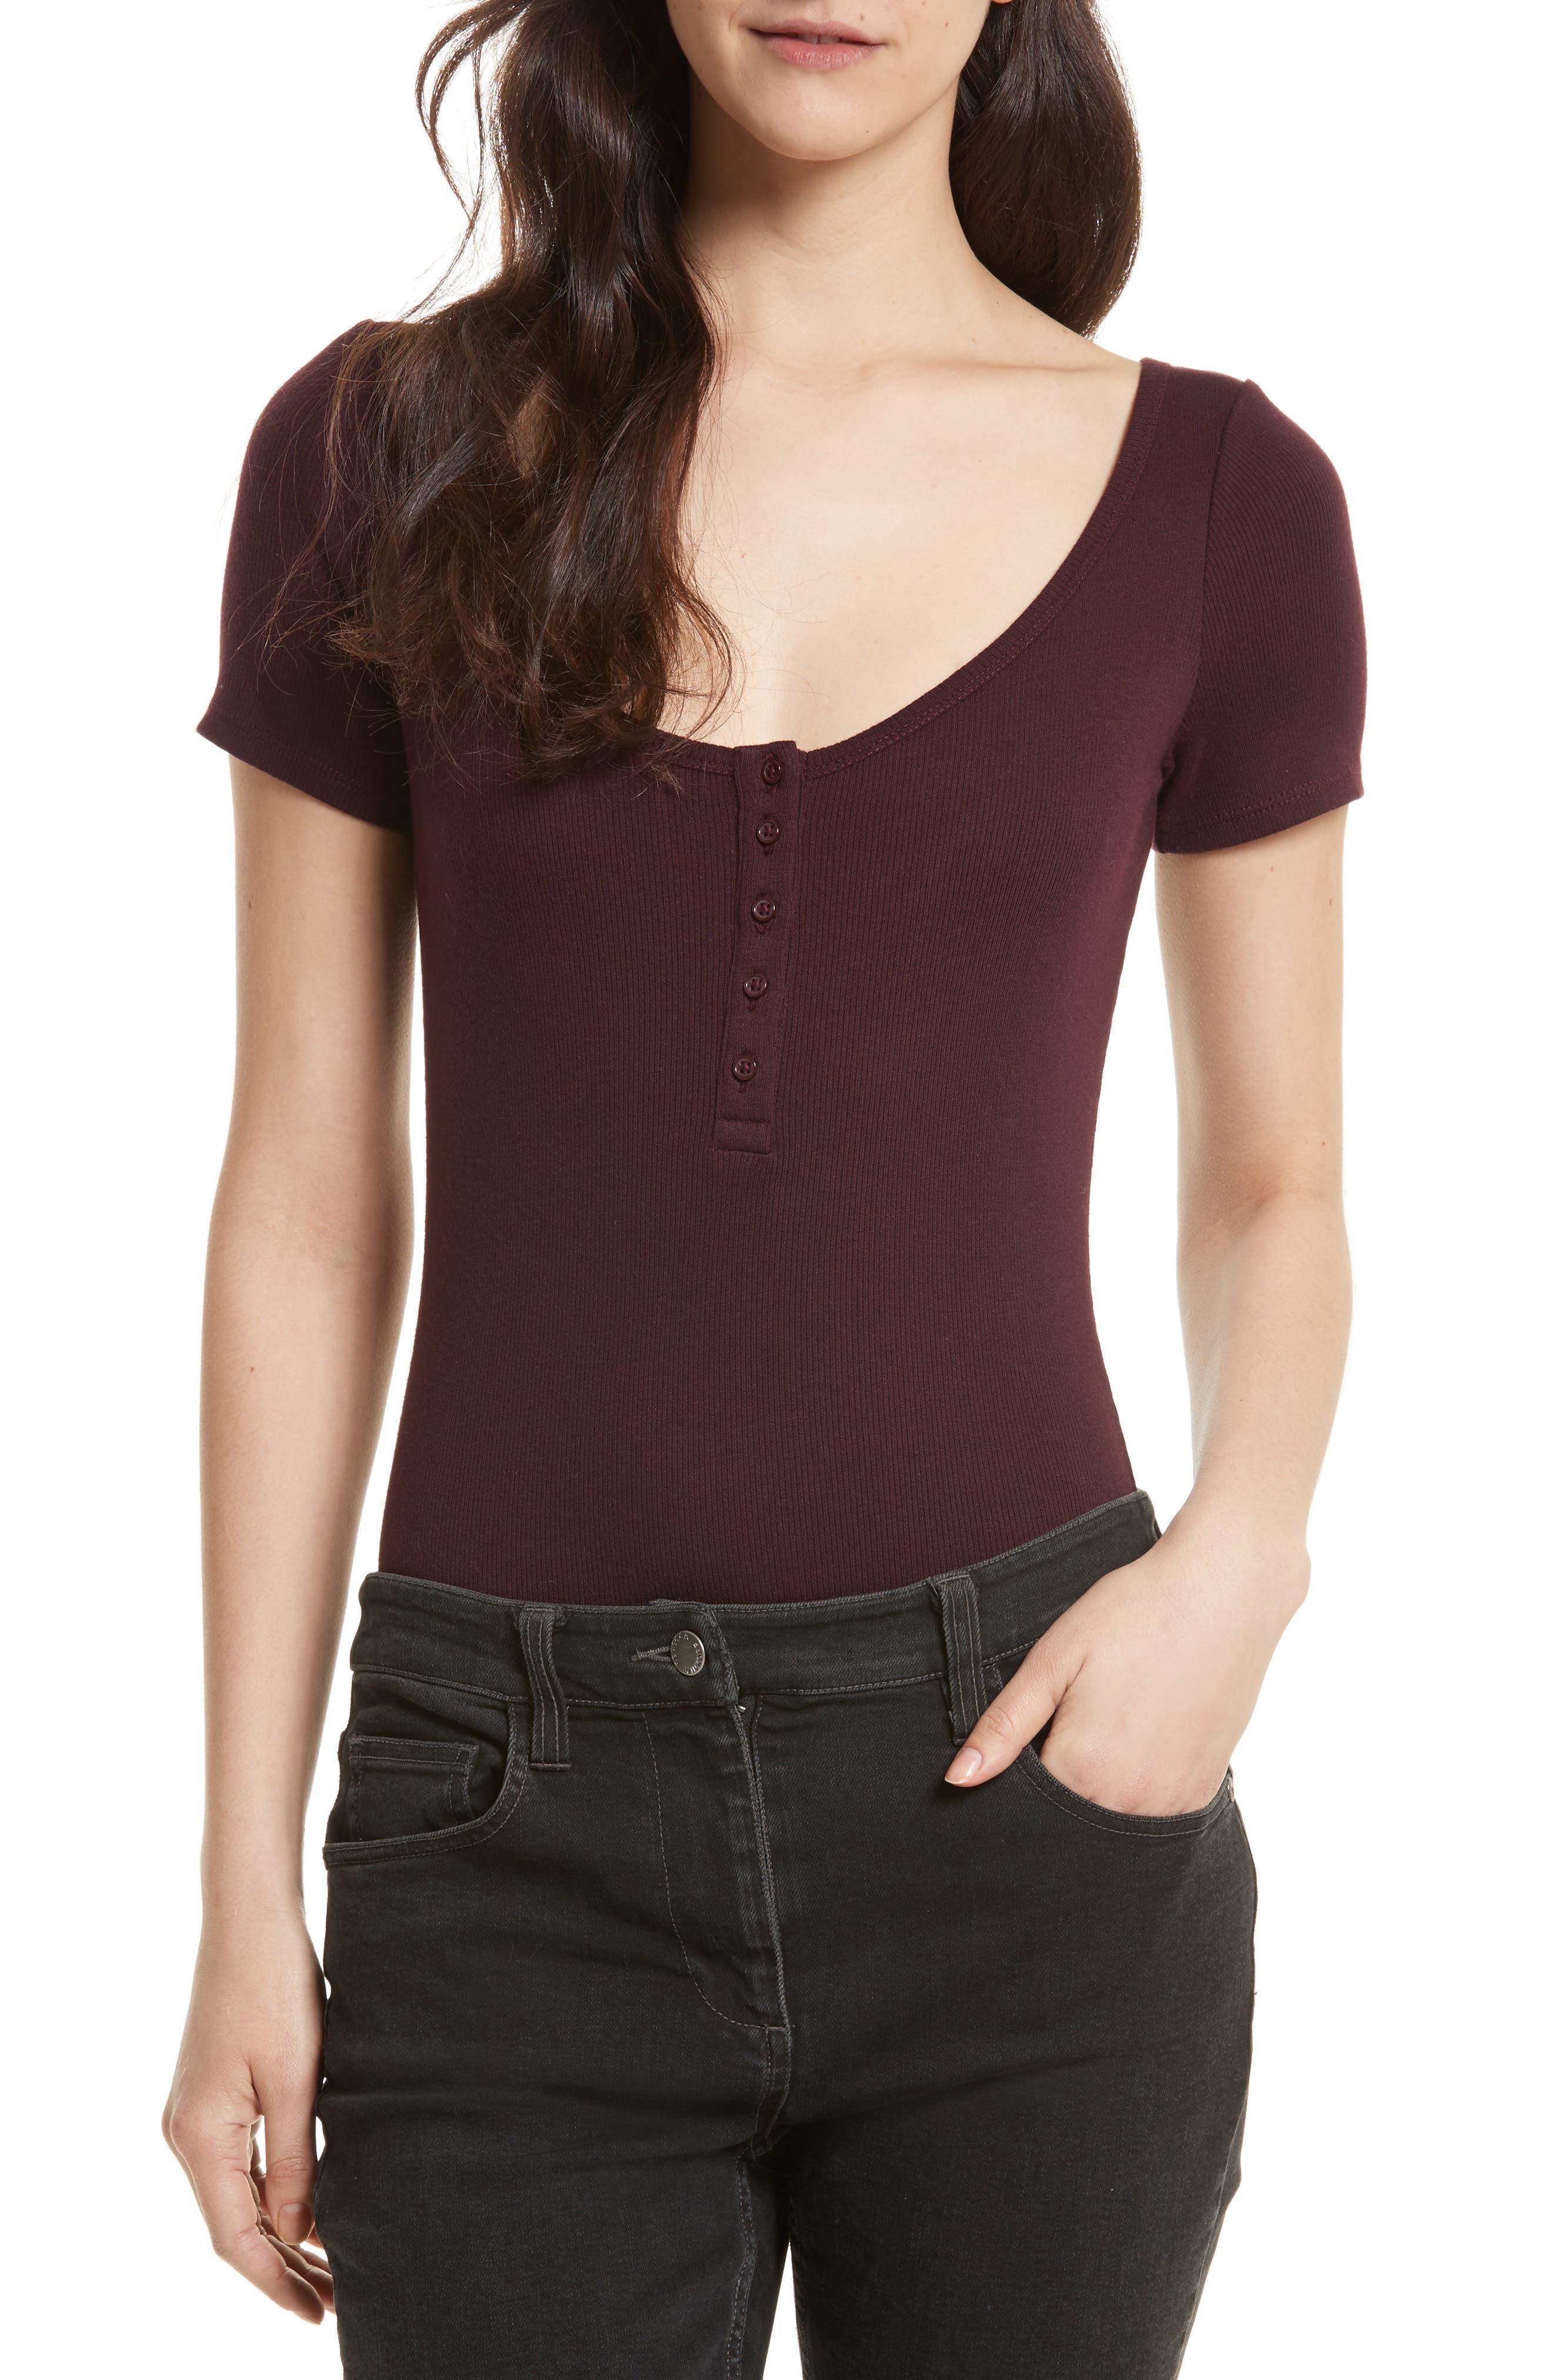 Rebecca Minkoff Parsnip Ribbed Bodysuit